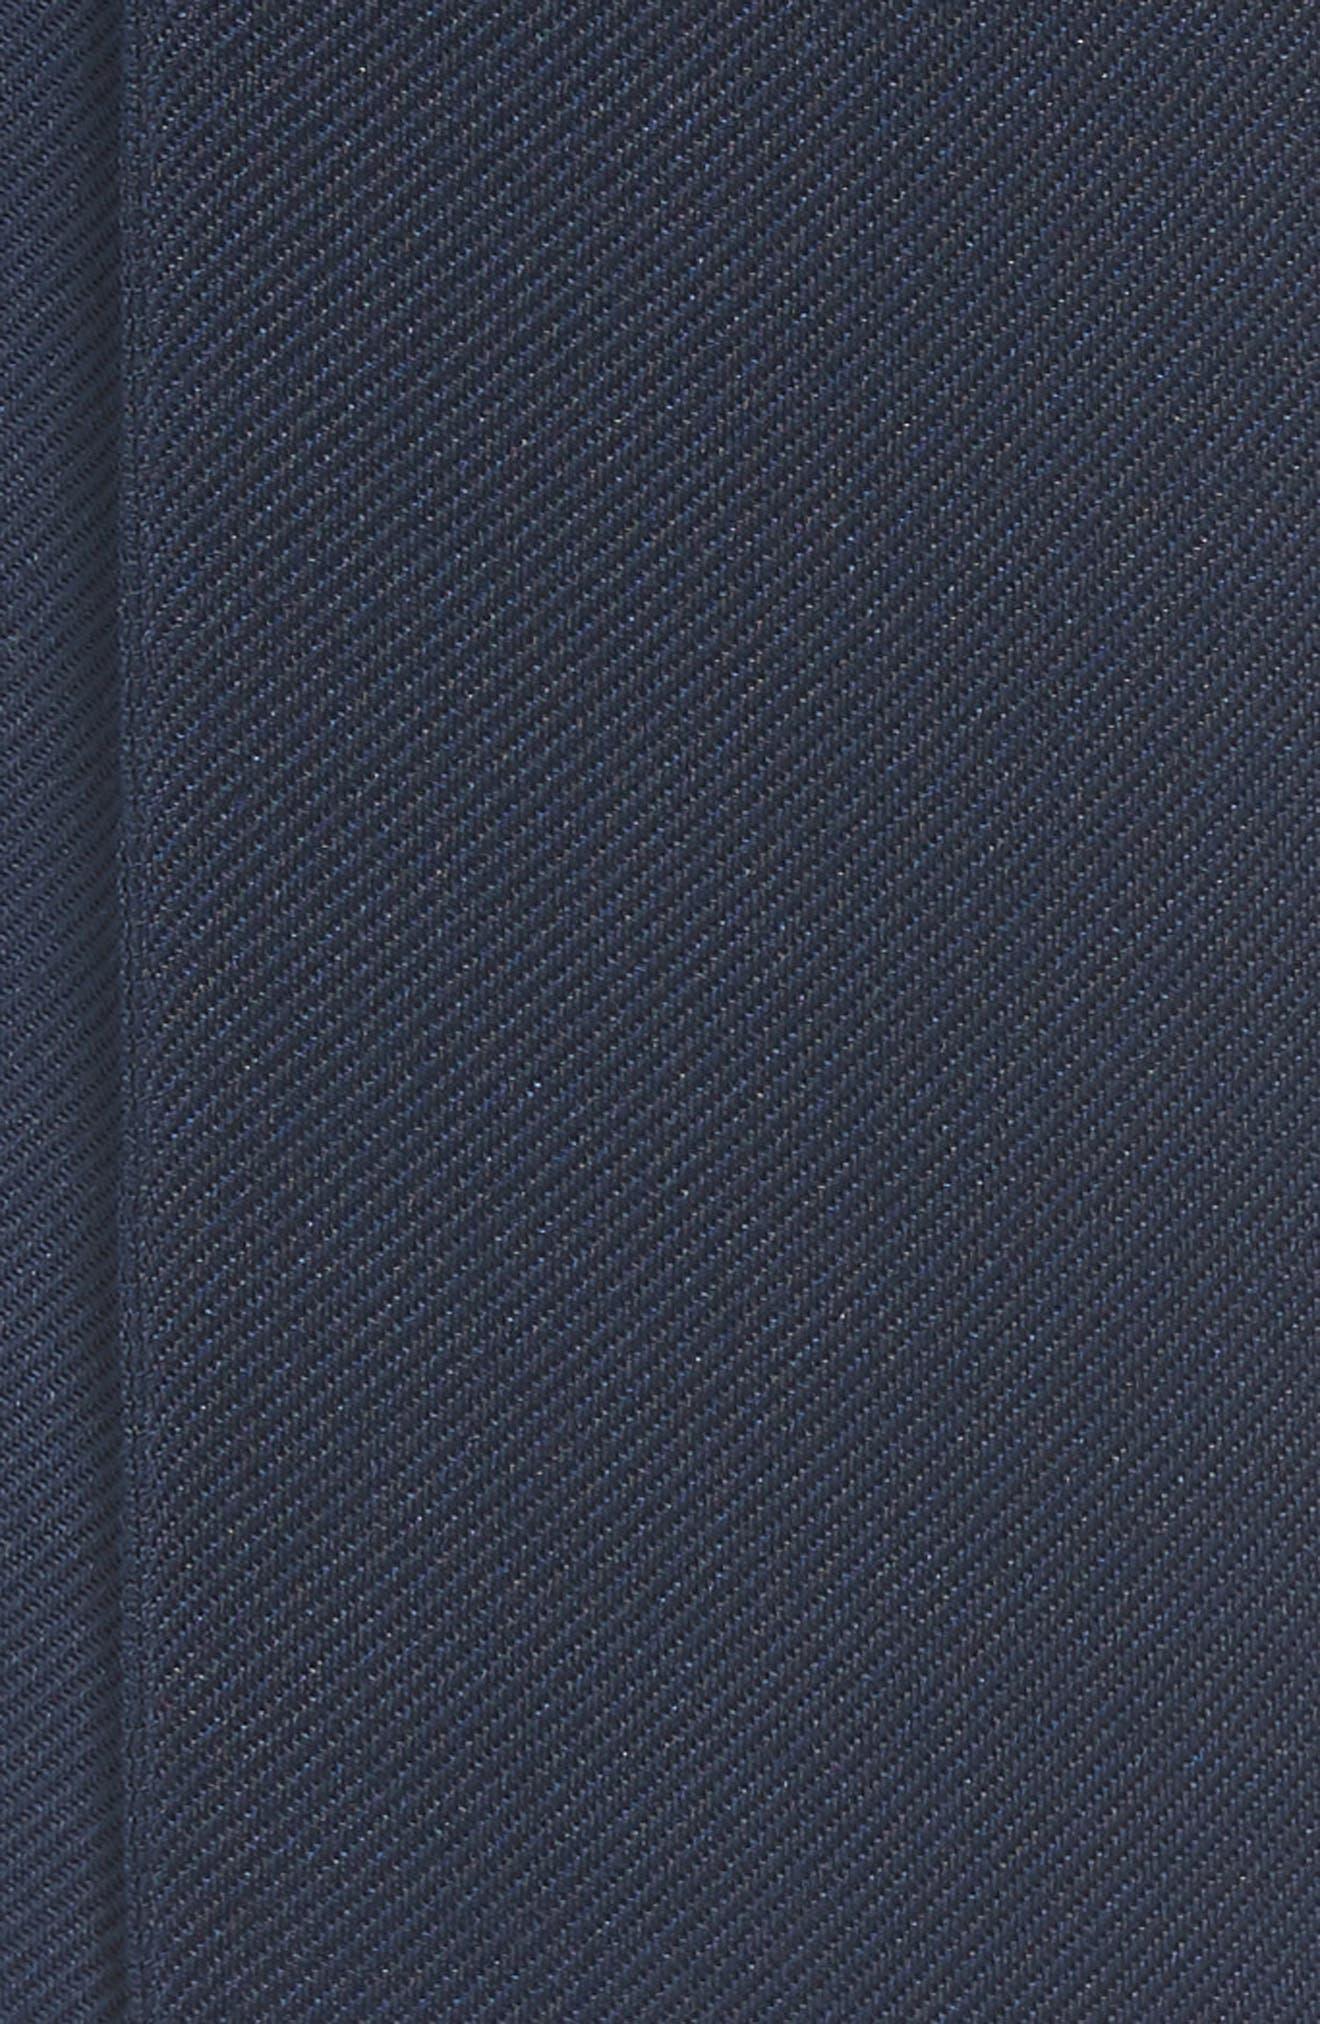 Molveno 2 Pants,                             Alternate thumbnail 10, color,